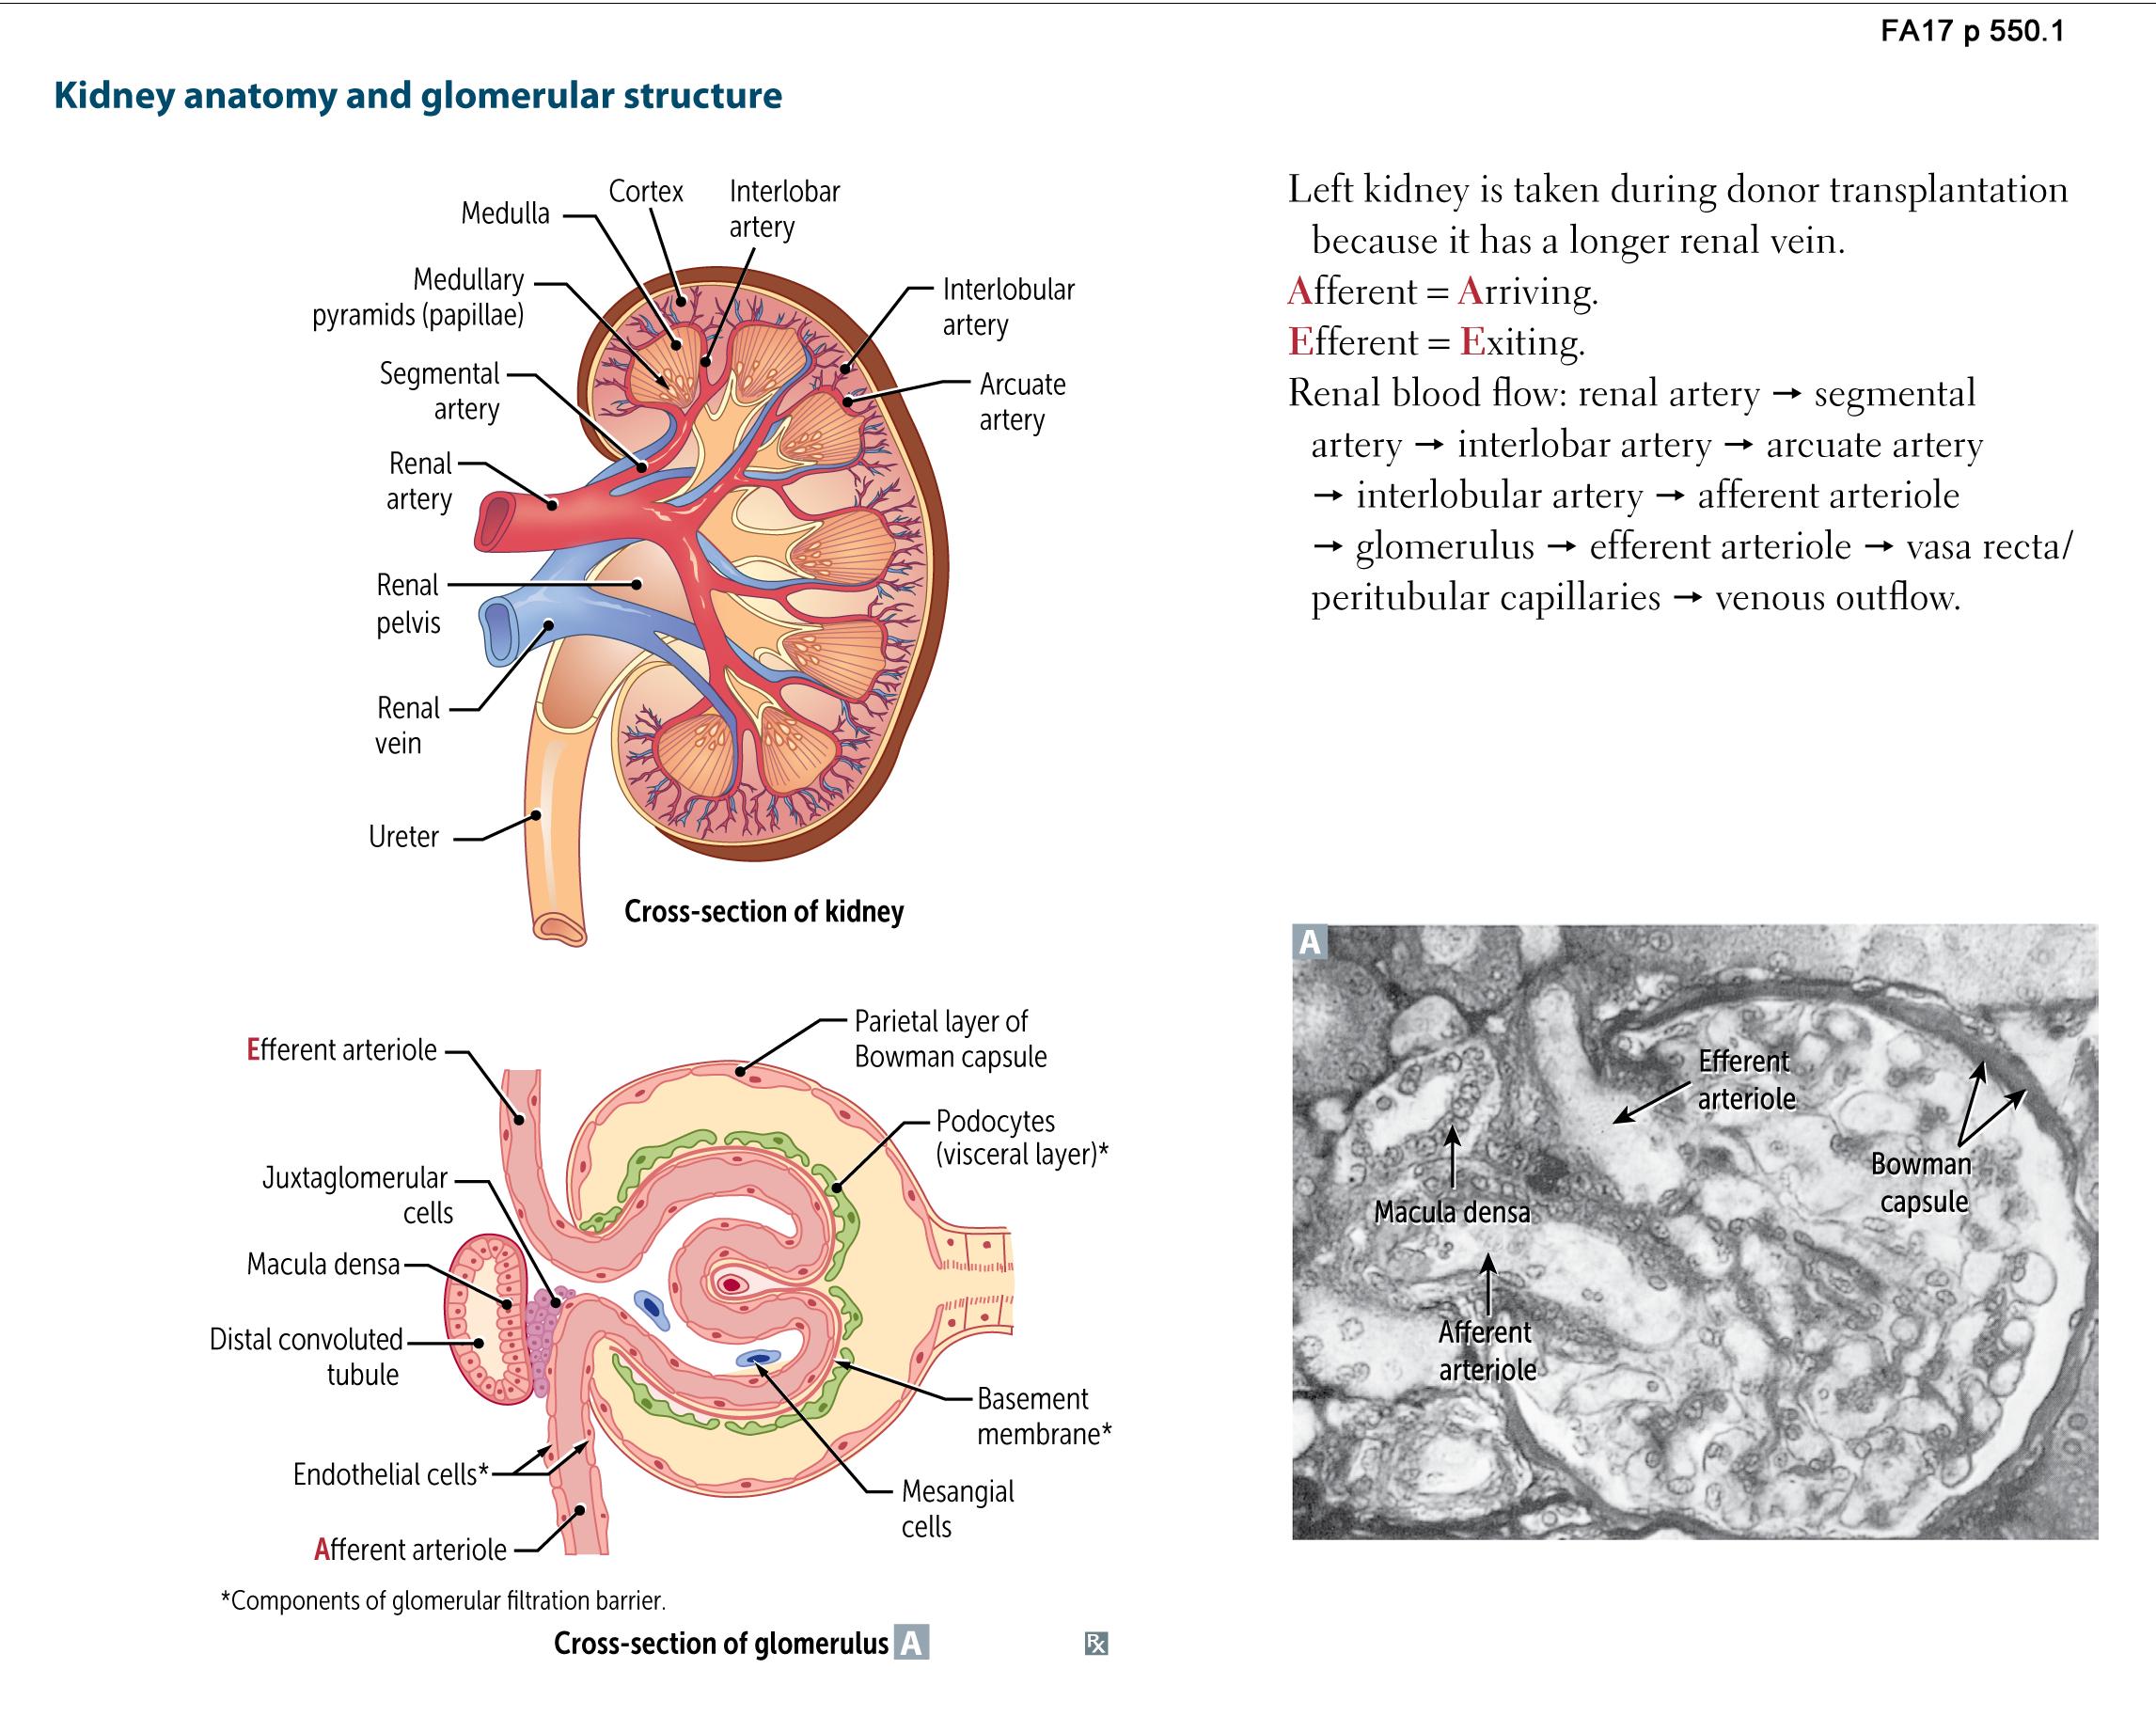 Renal Anatomy - Kidney anatomy and glomerular structure Flashcards ...